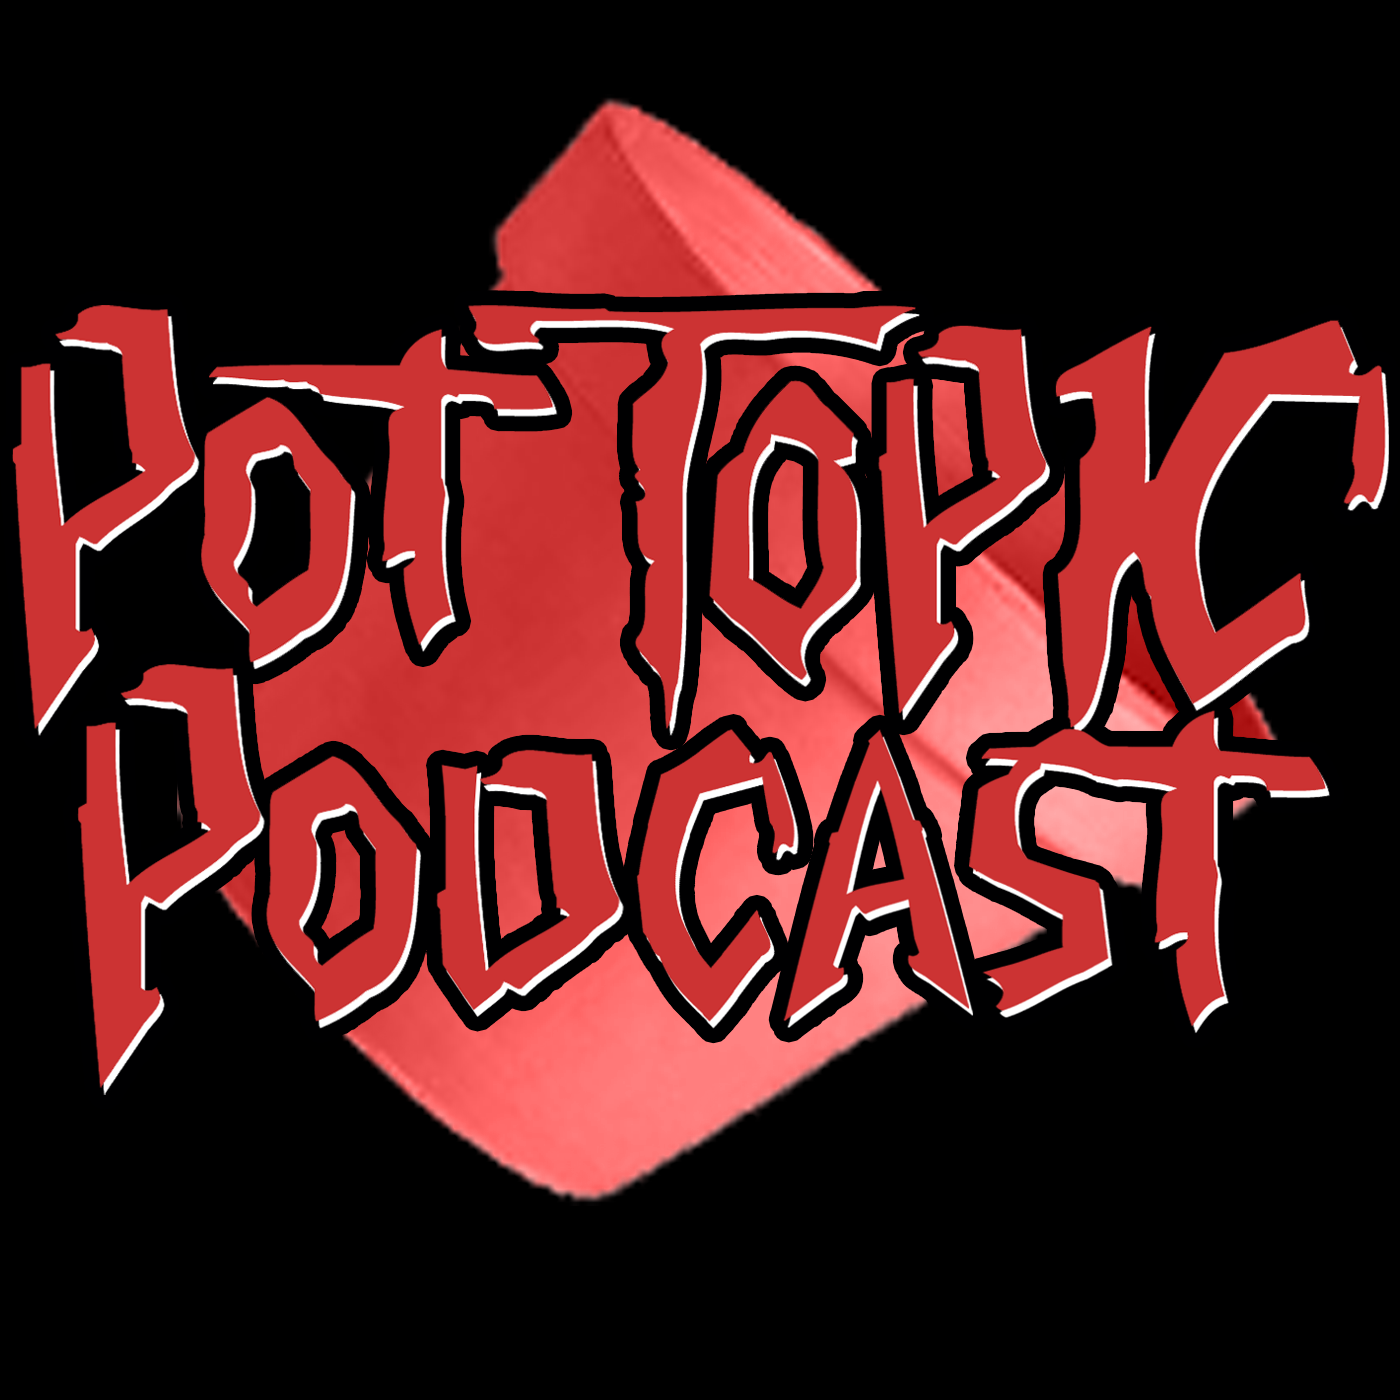 Pot Topic Podcast show art